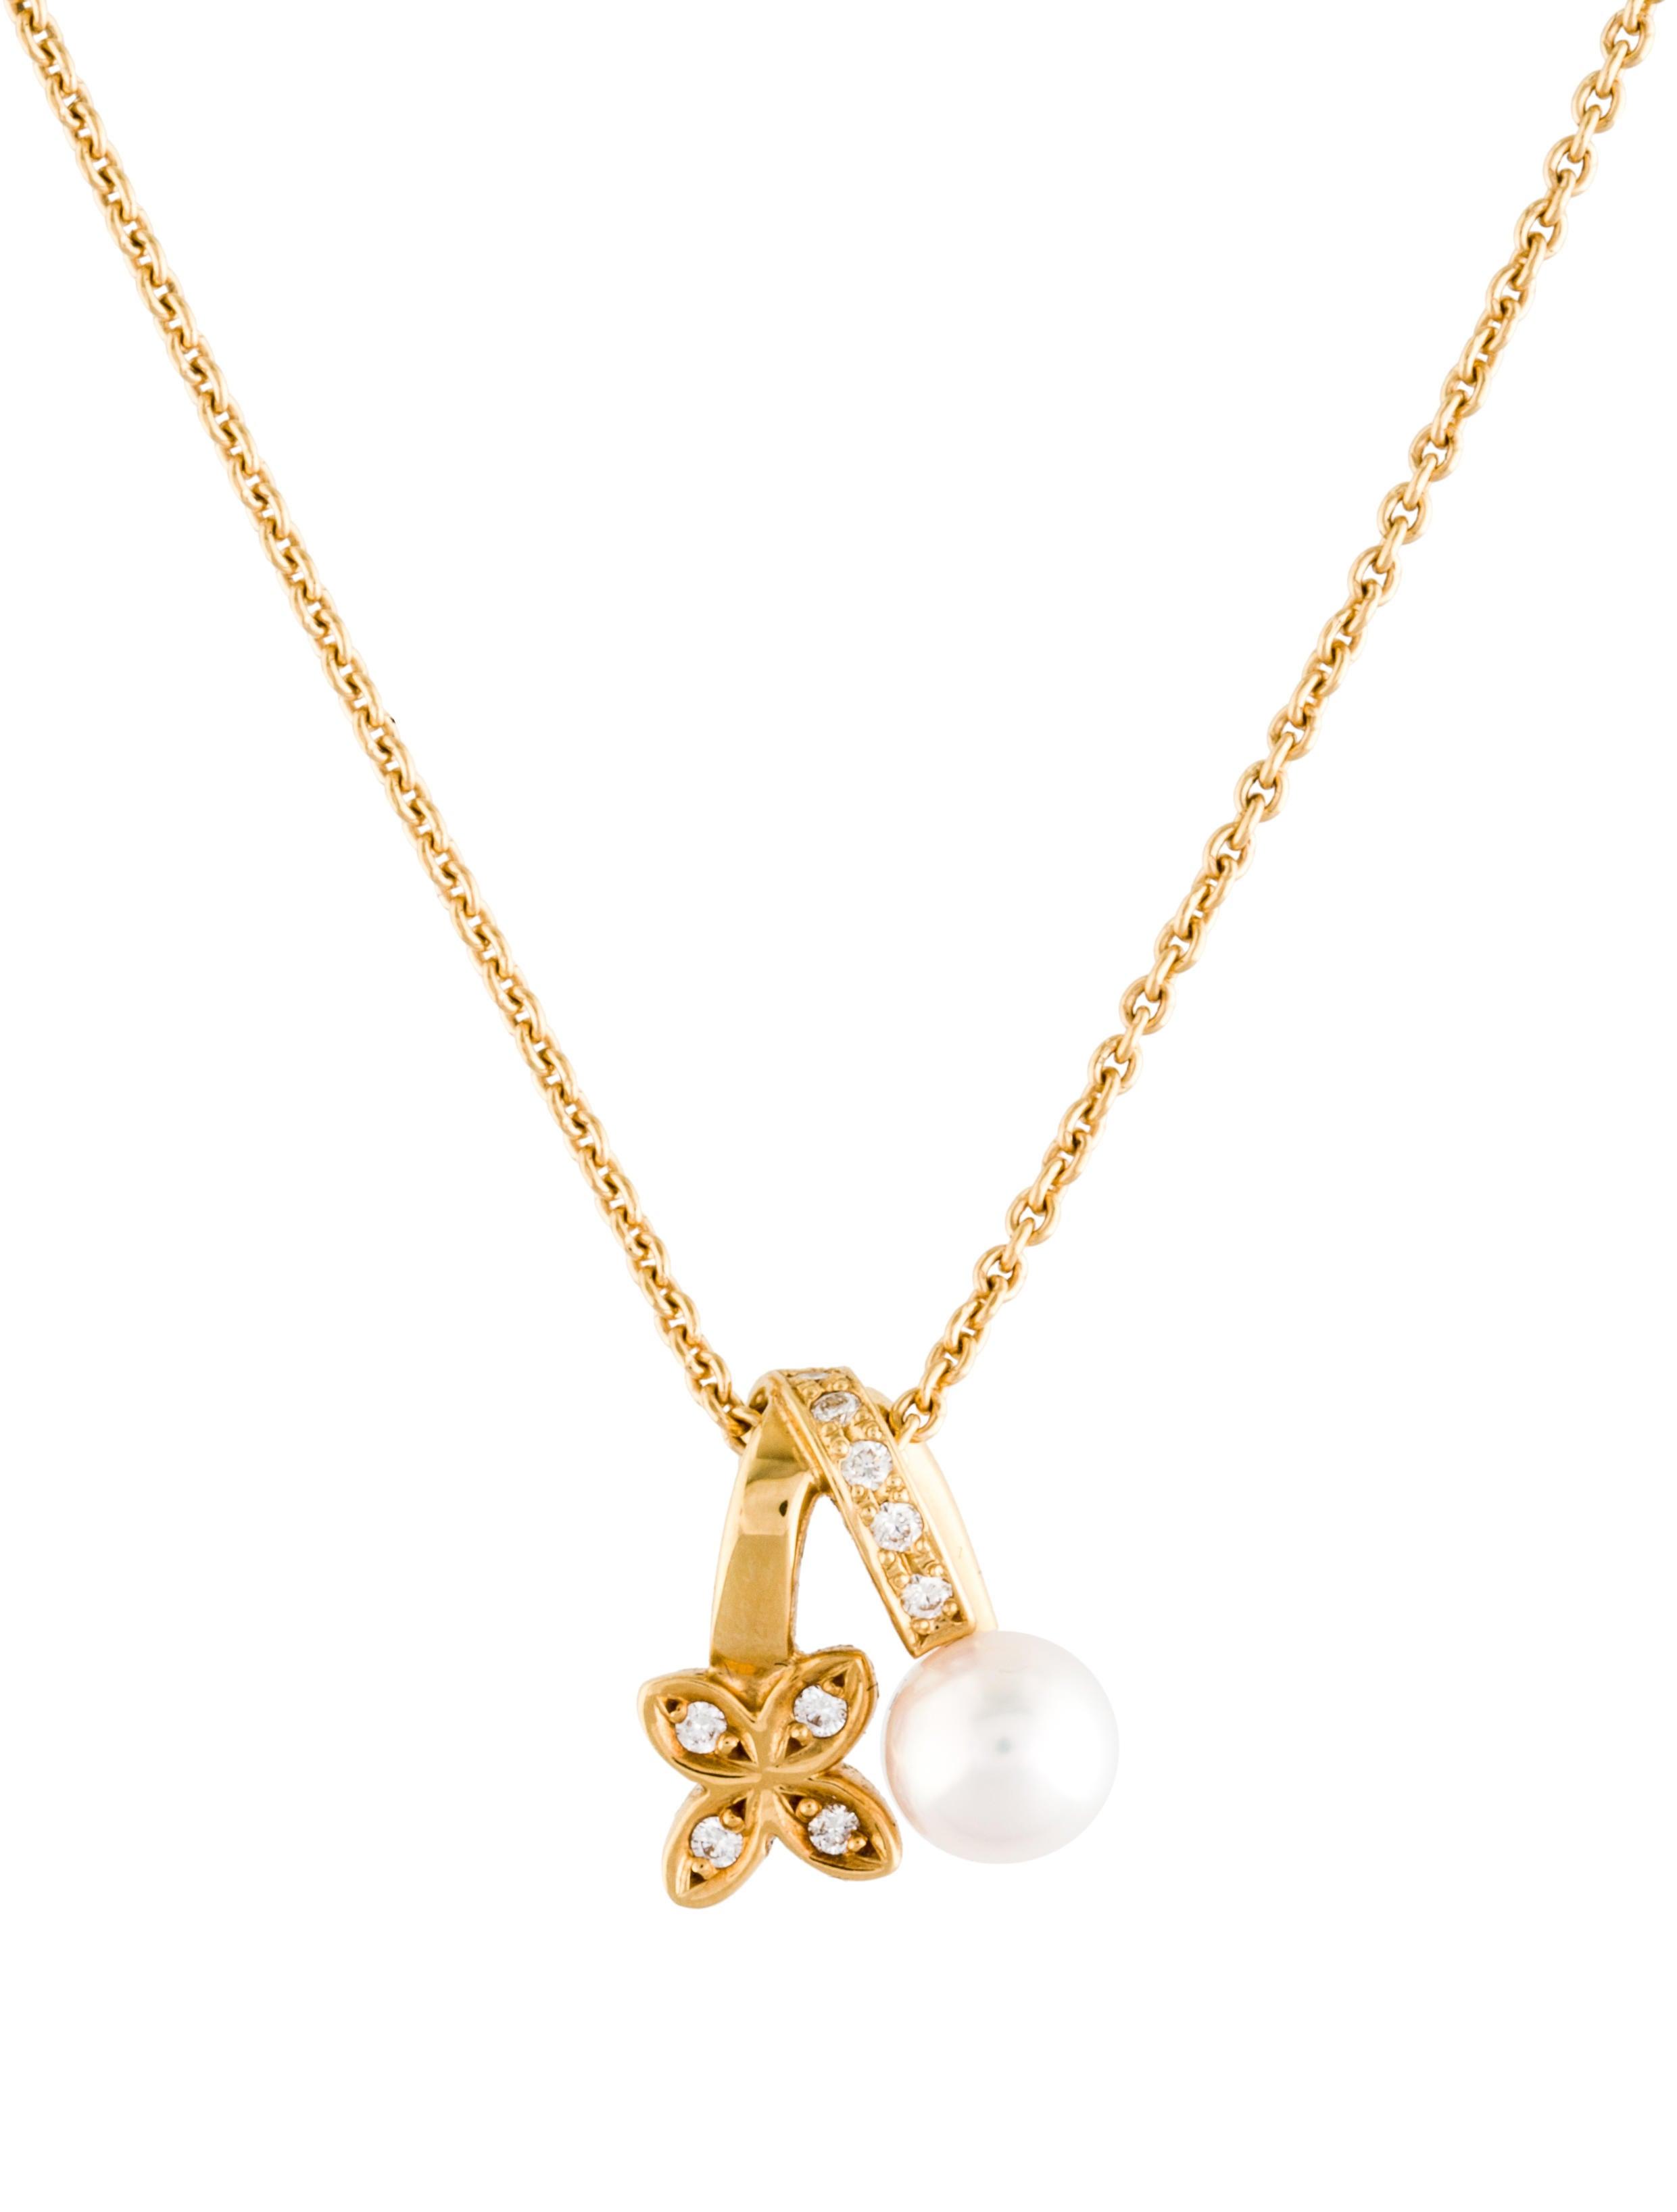 mikimoto 18k akoya cultured pearl clover pendant necklace. Black Bedroom Furniture Sets. Home Design Ideas